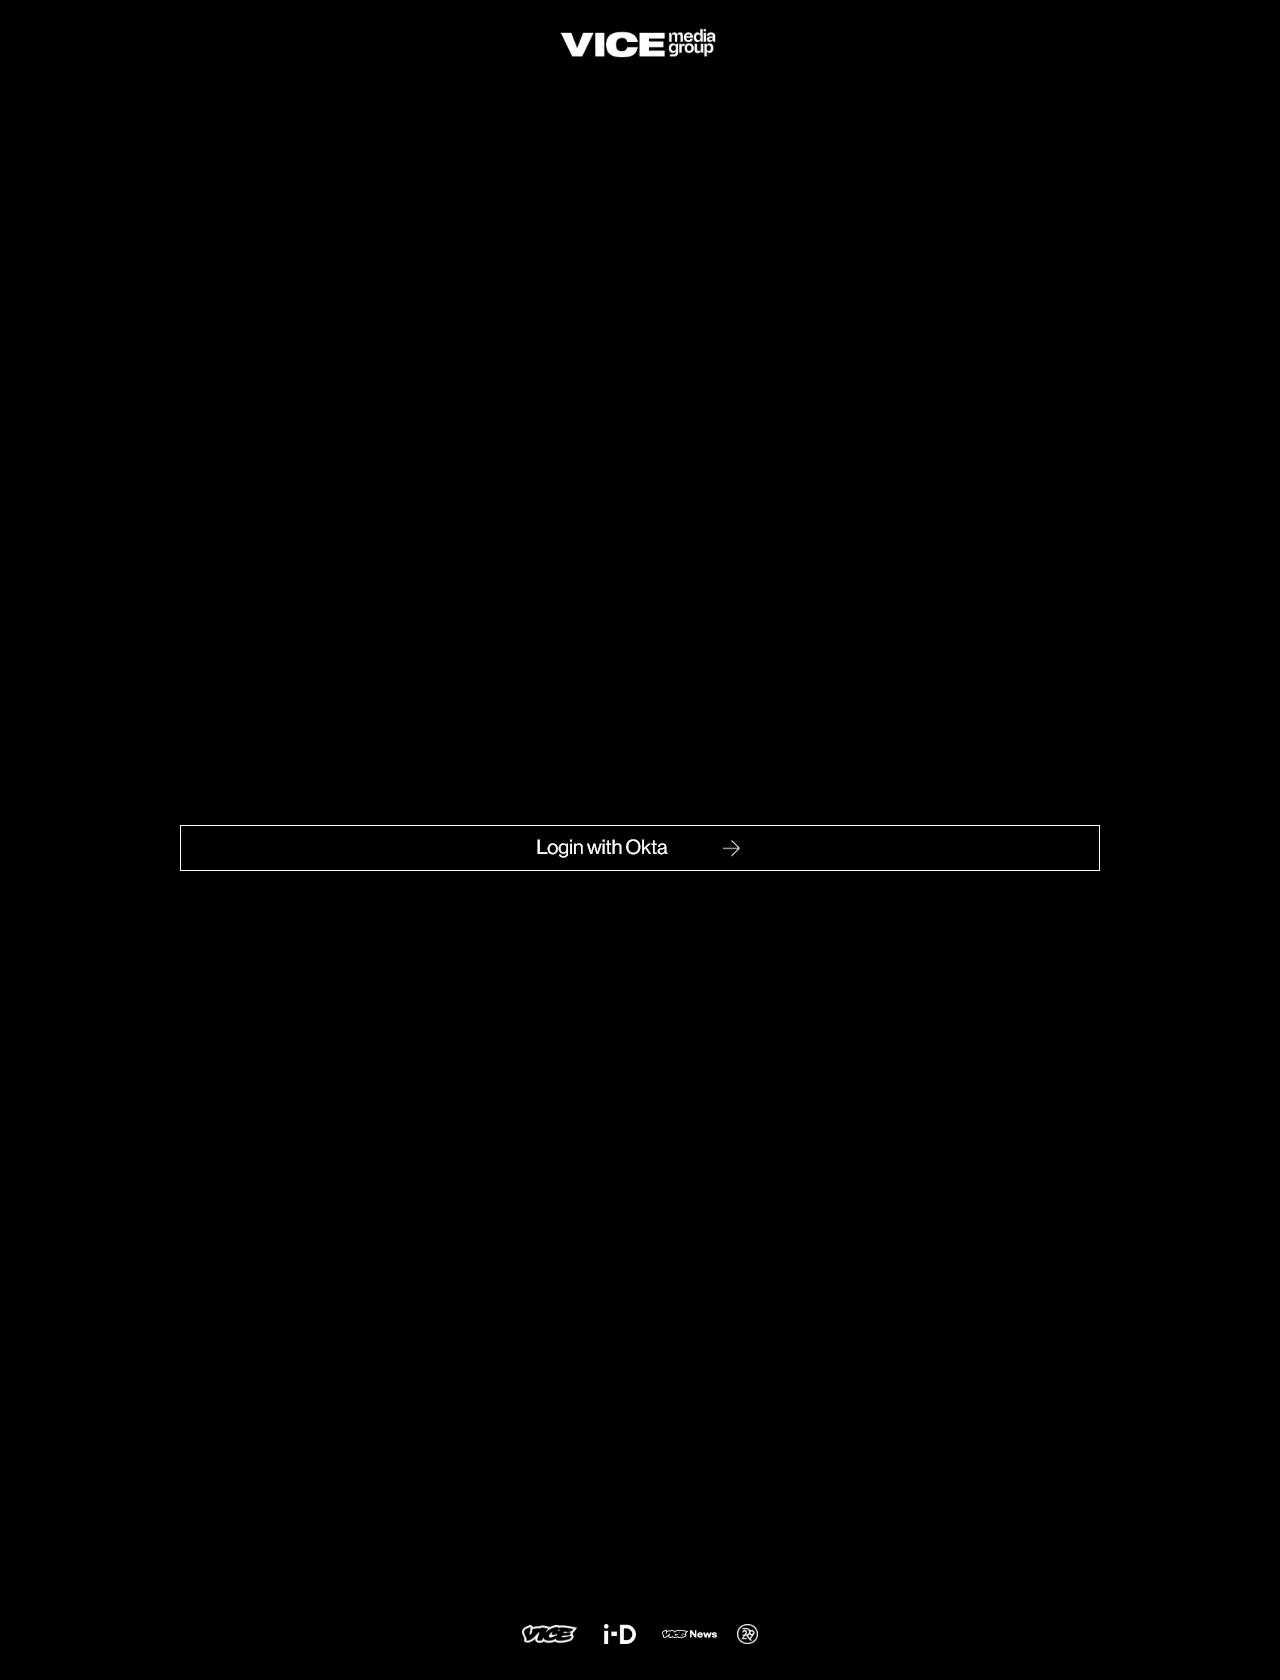 Screenshot Desktop - https://dev.storiesstudio.vice.technology/login